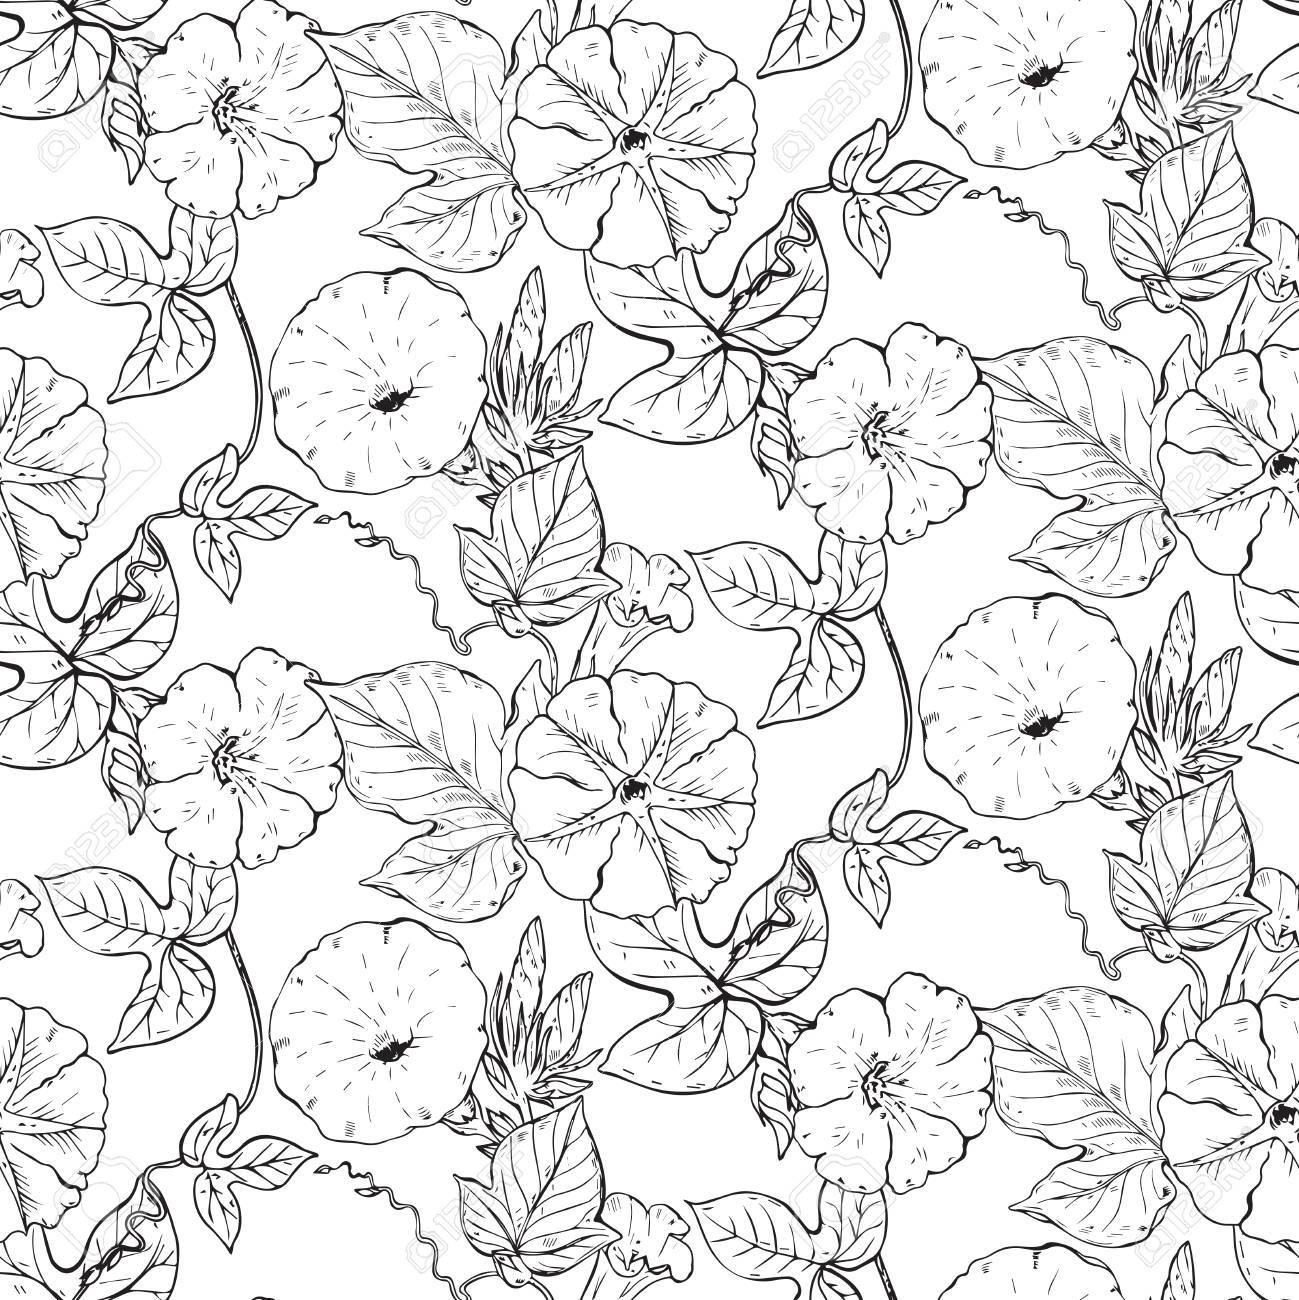 Patrón Transparente De Vector Con Flores De Enredadera De Dibujado A ...